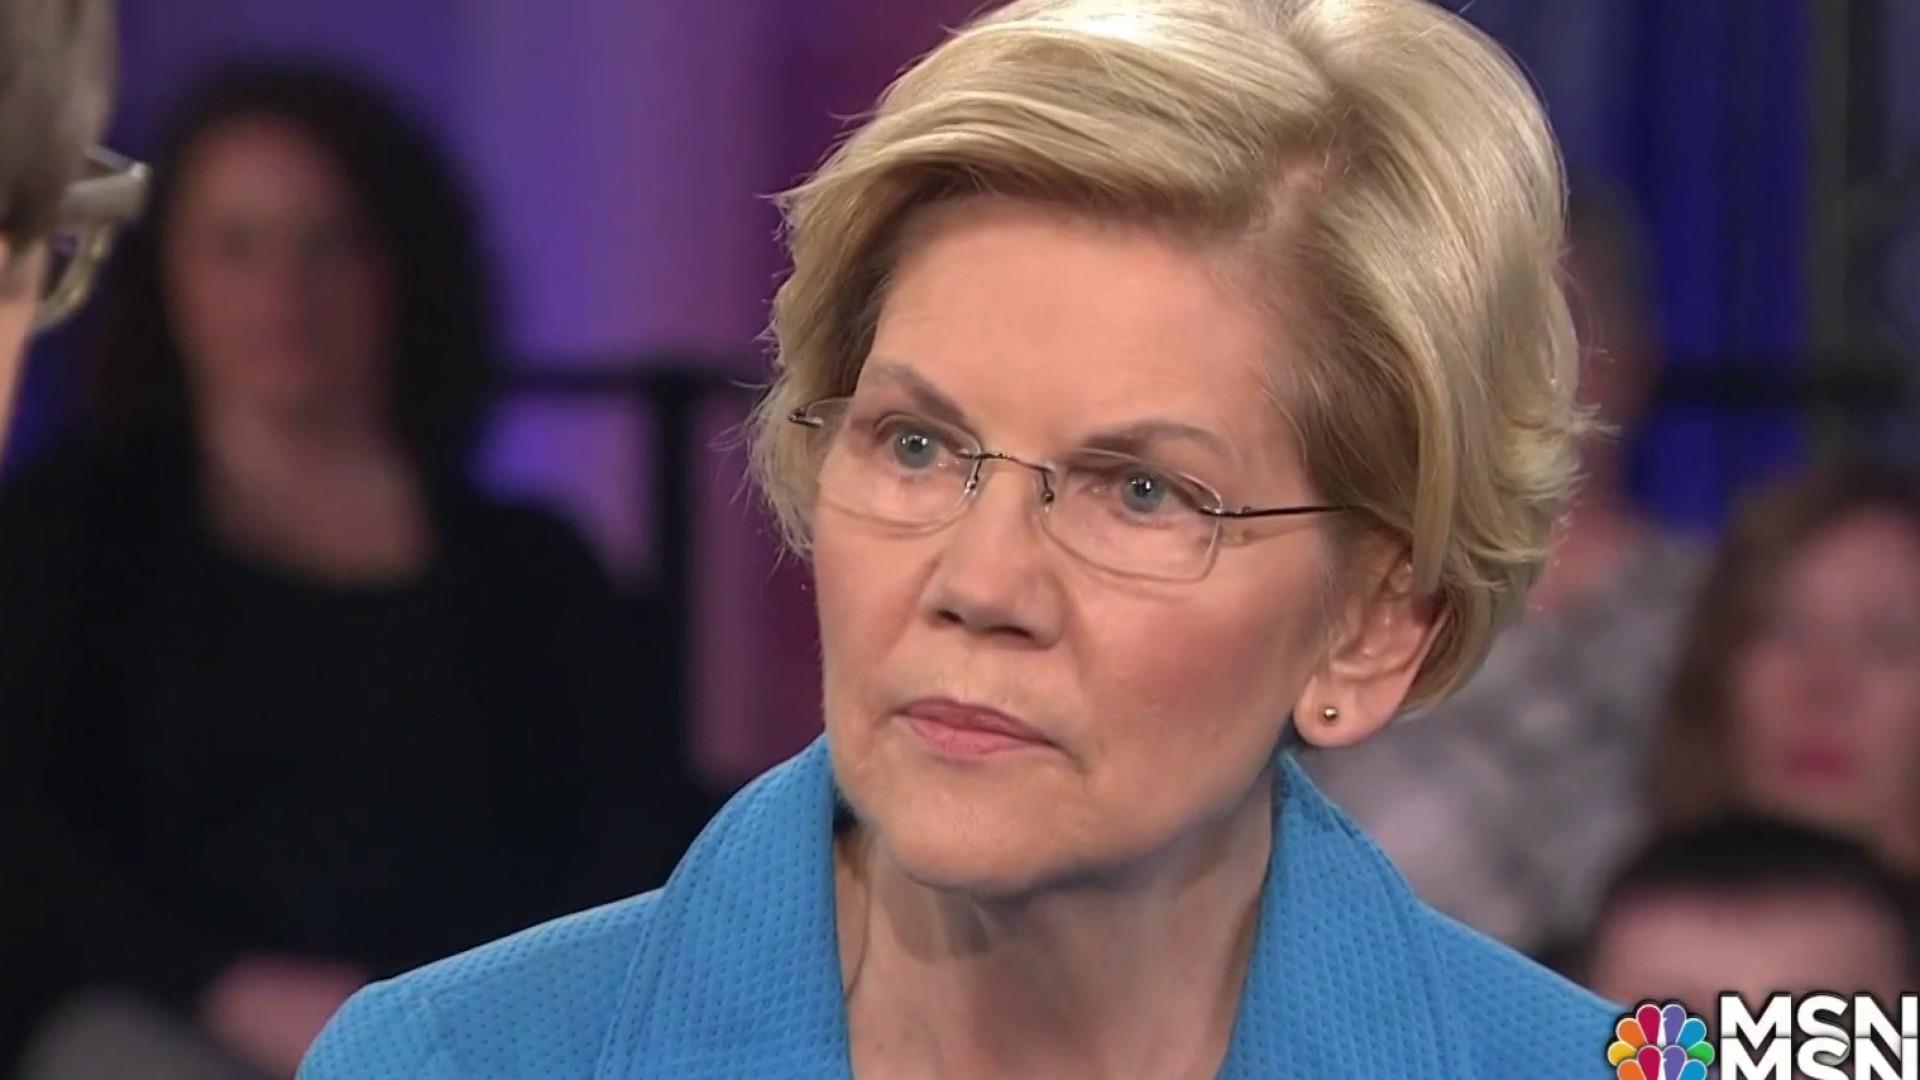 Elizabeth Warren brings personal intensity to town hall issues